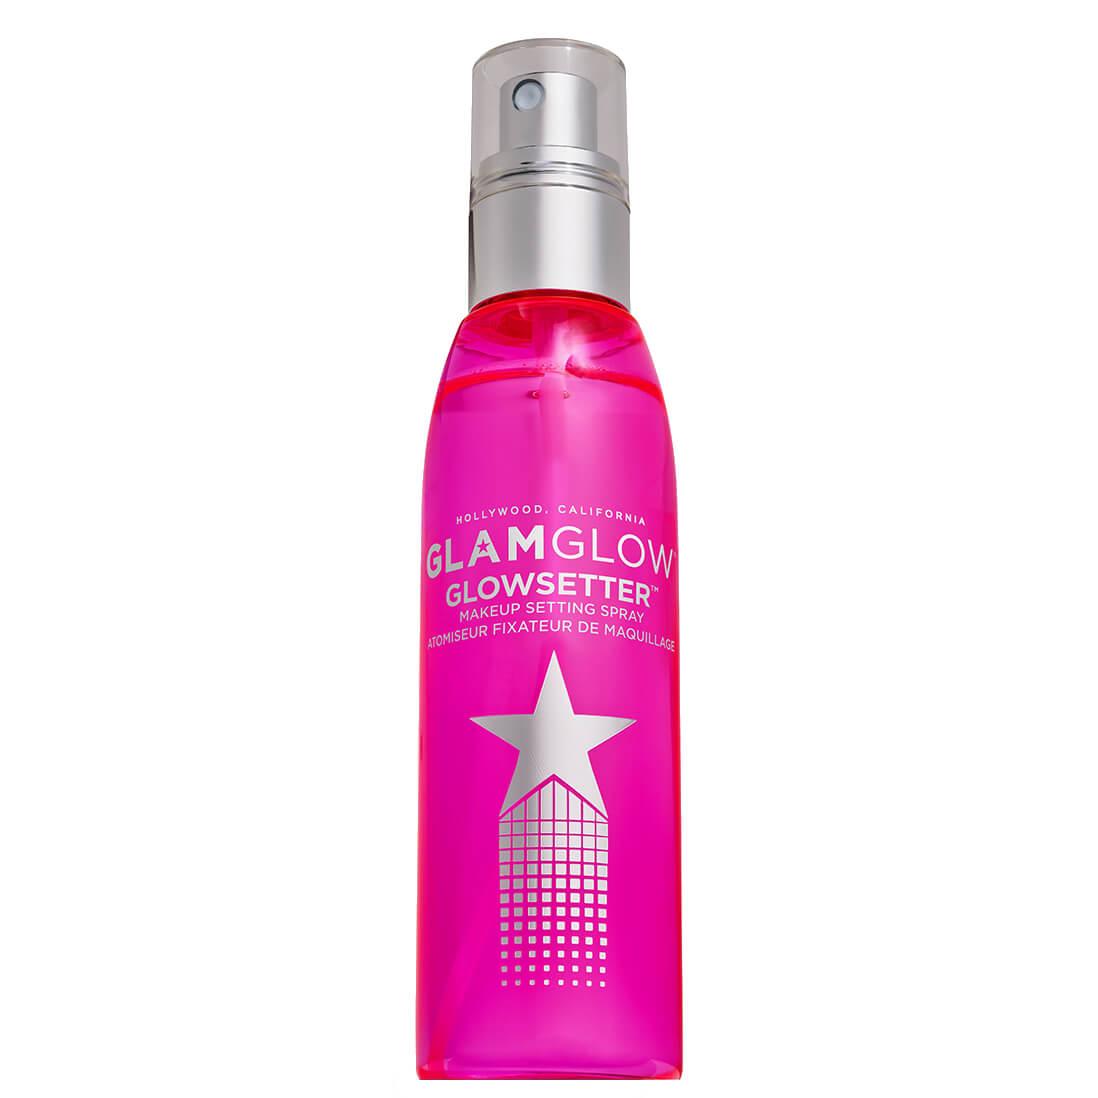 Glamglow Glowsetter spray fissante per make-up 110 ml